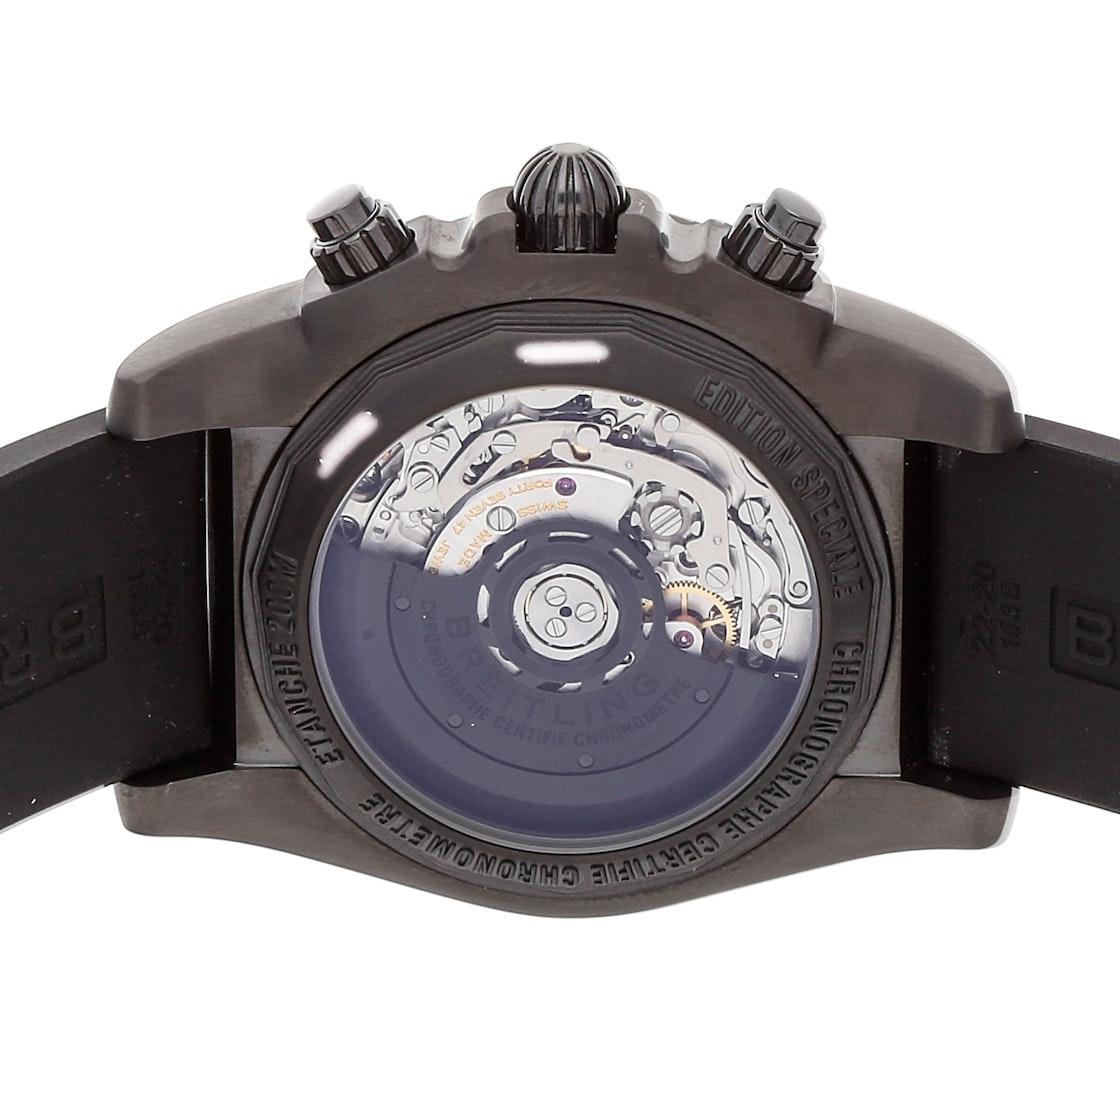 Breitling Black Chronomat 44 Special Edition MB0111C3/I531